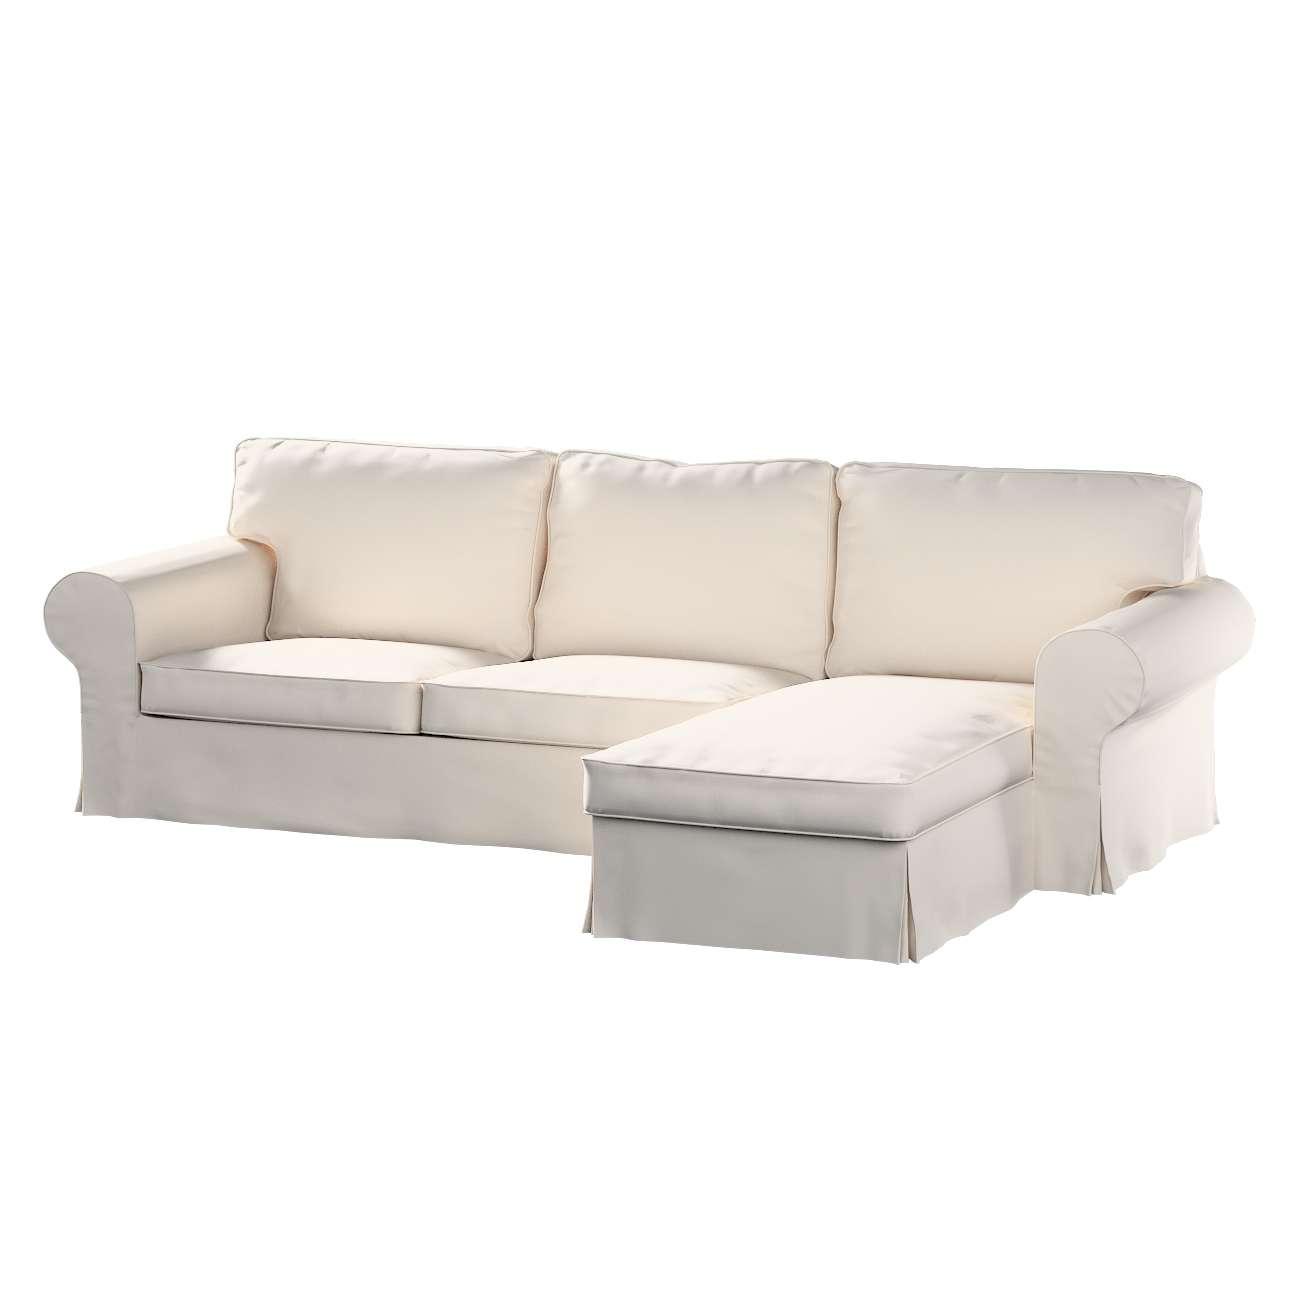 Ektorp 2-Sitzer Sofabezug mit Recamiere Ektorp 2-Sitzer Sofabezug mit Recamiere von der Kollektion Etna, Stoff: 705-01